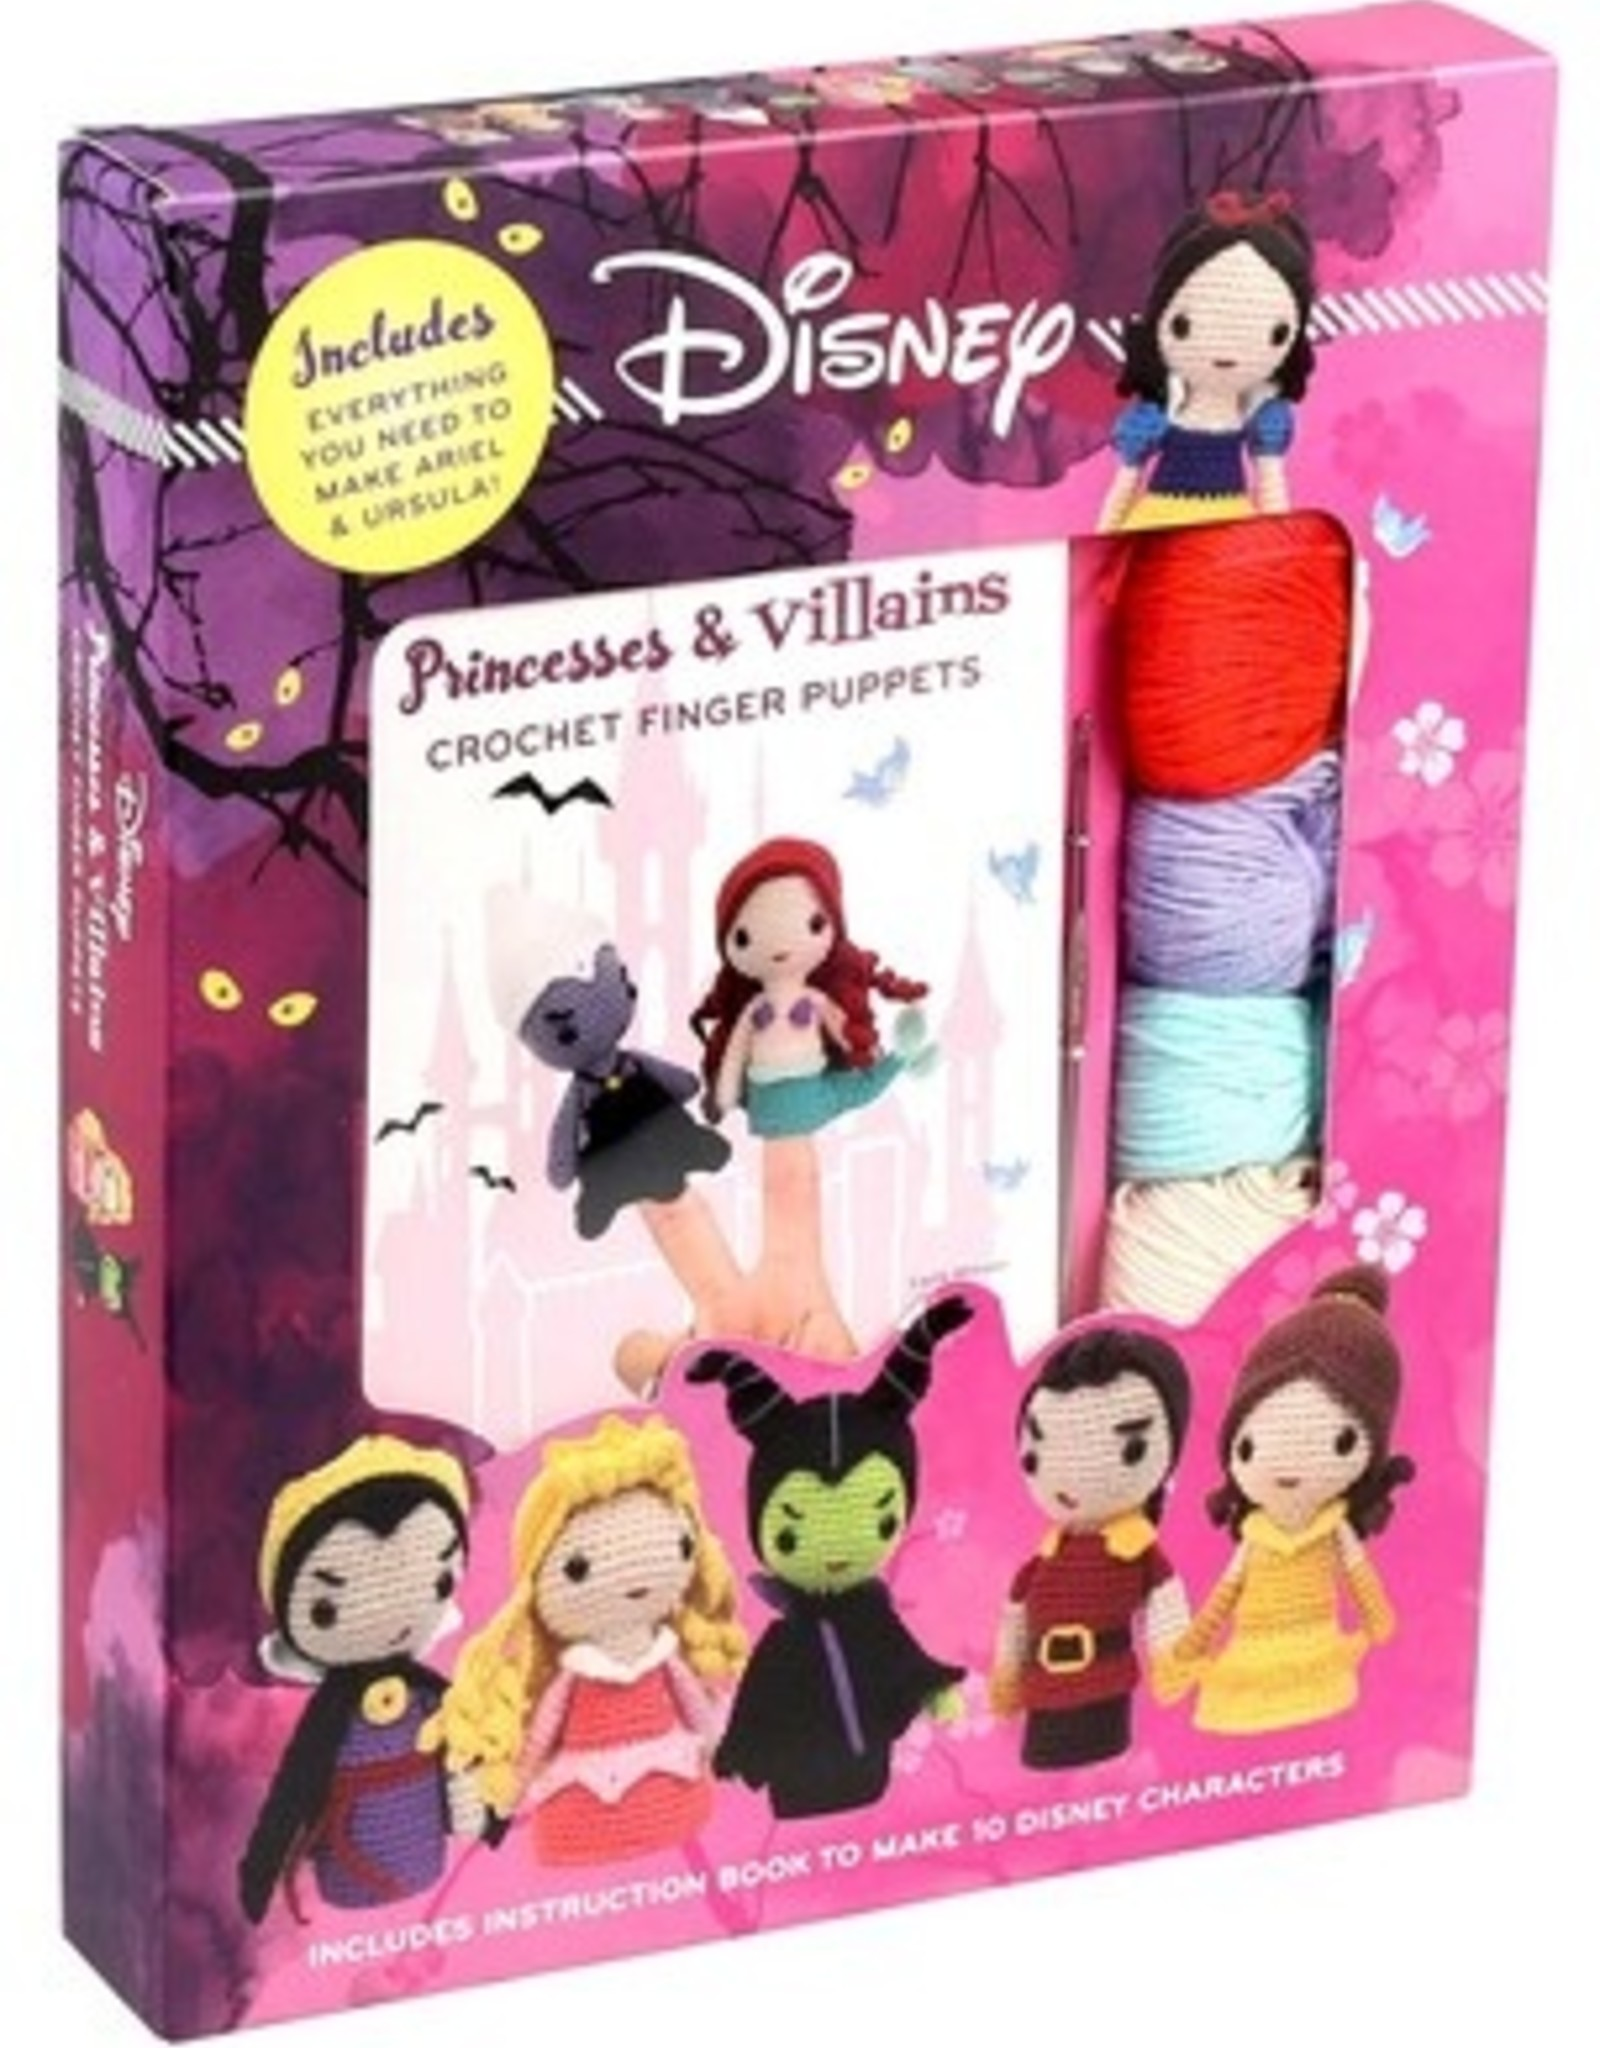 Disney Princesses & Villains Crochet Finger Puppets